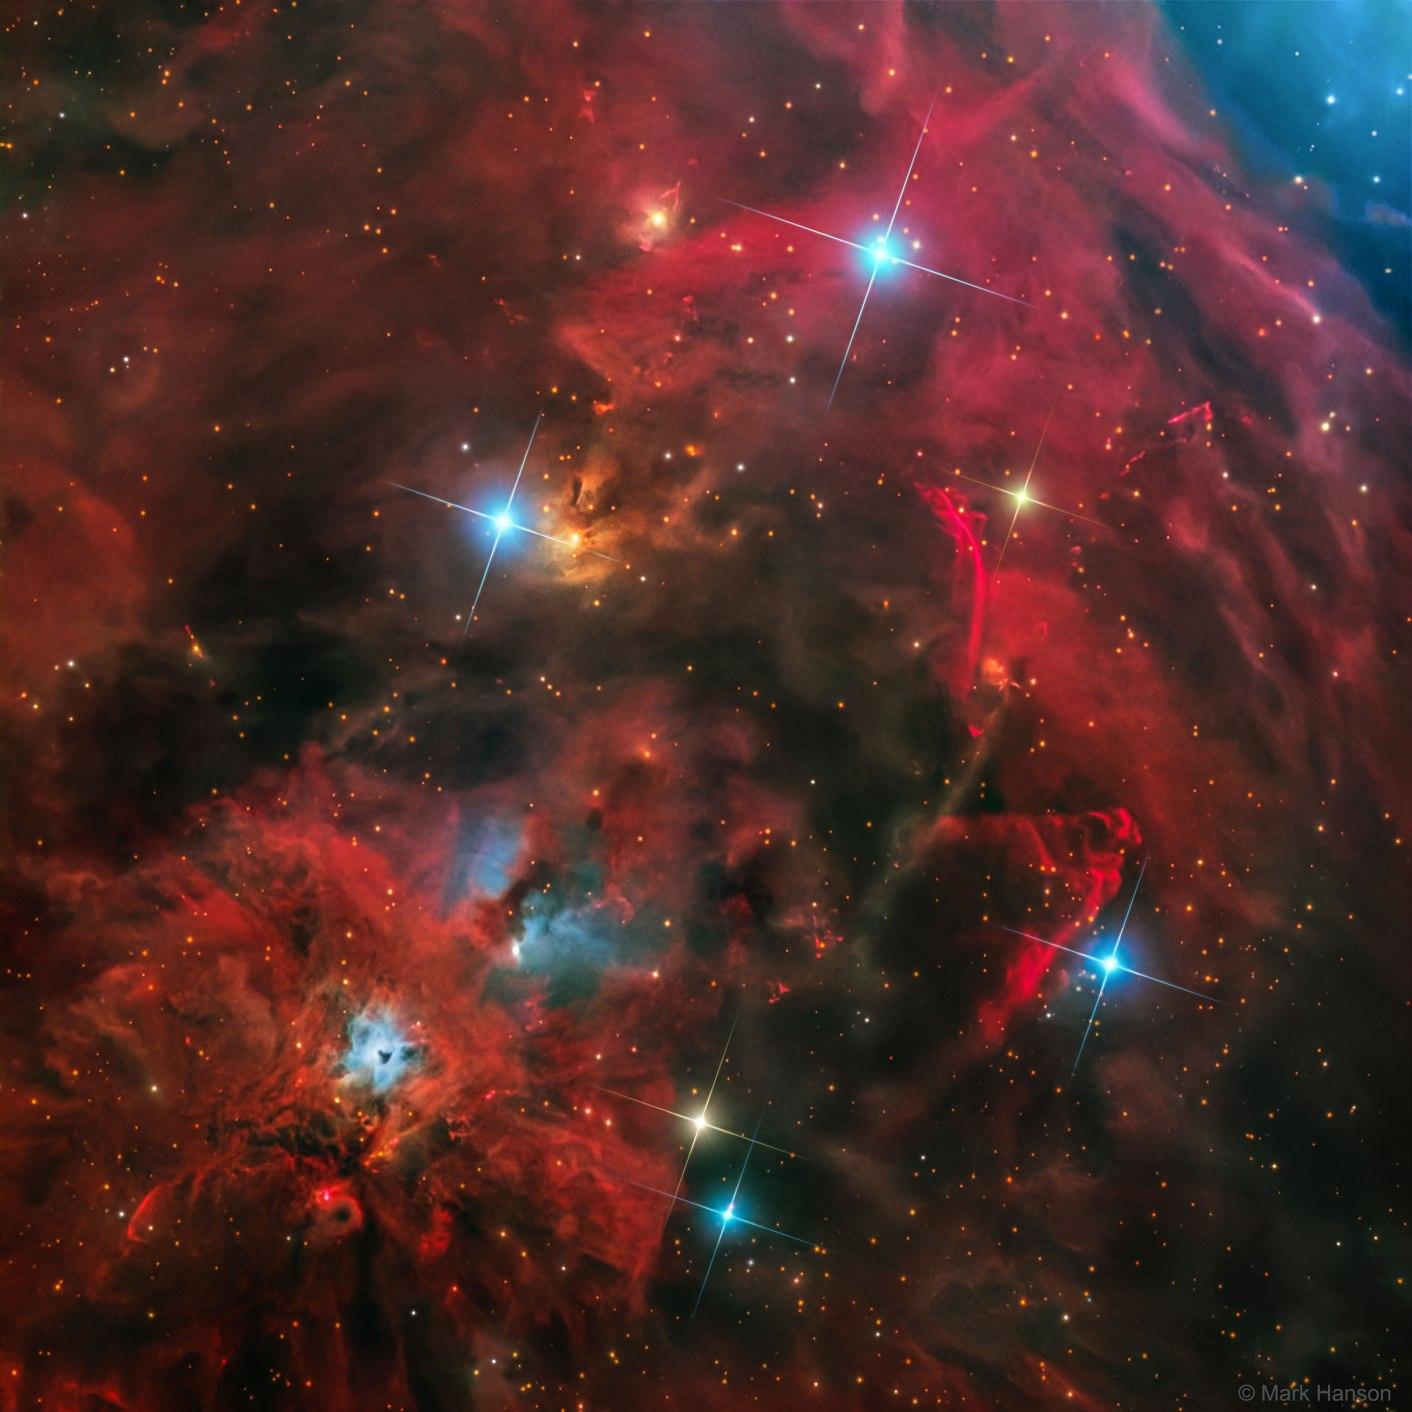 NGC1999_Hanson_3847